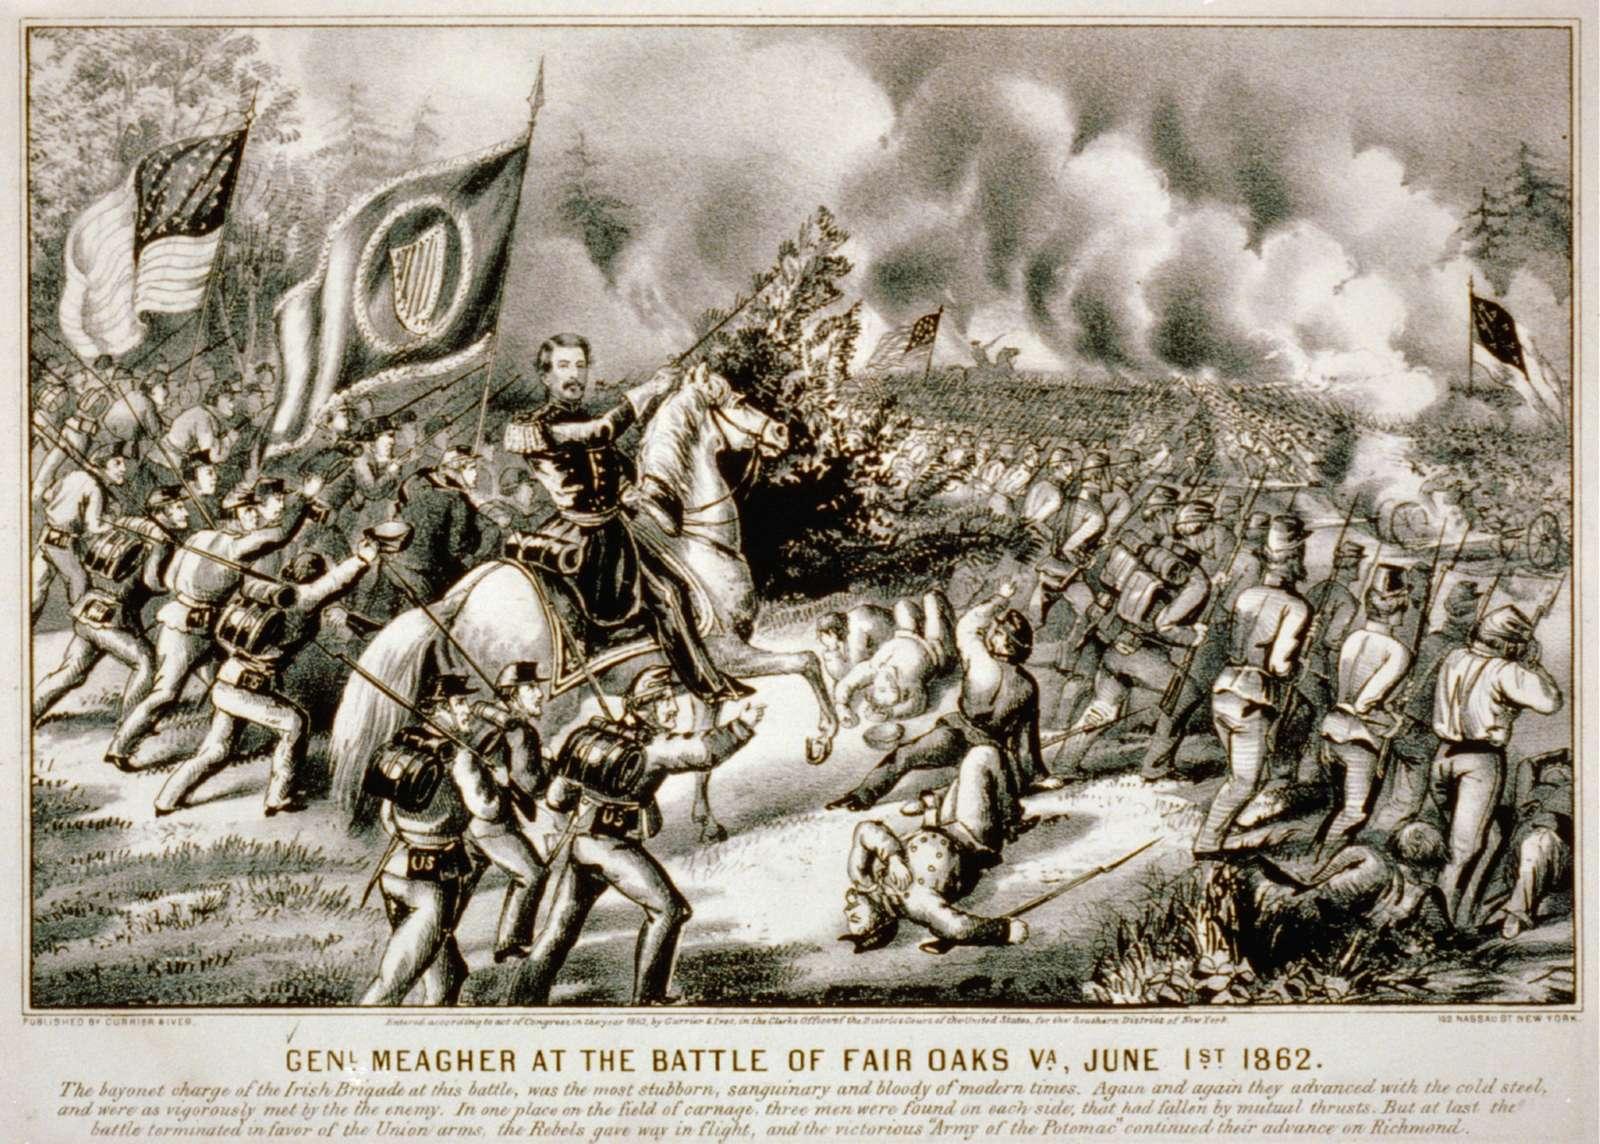 Genl. Meagher at the Battle of Fair Oaks Va., June 1st 1862